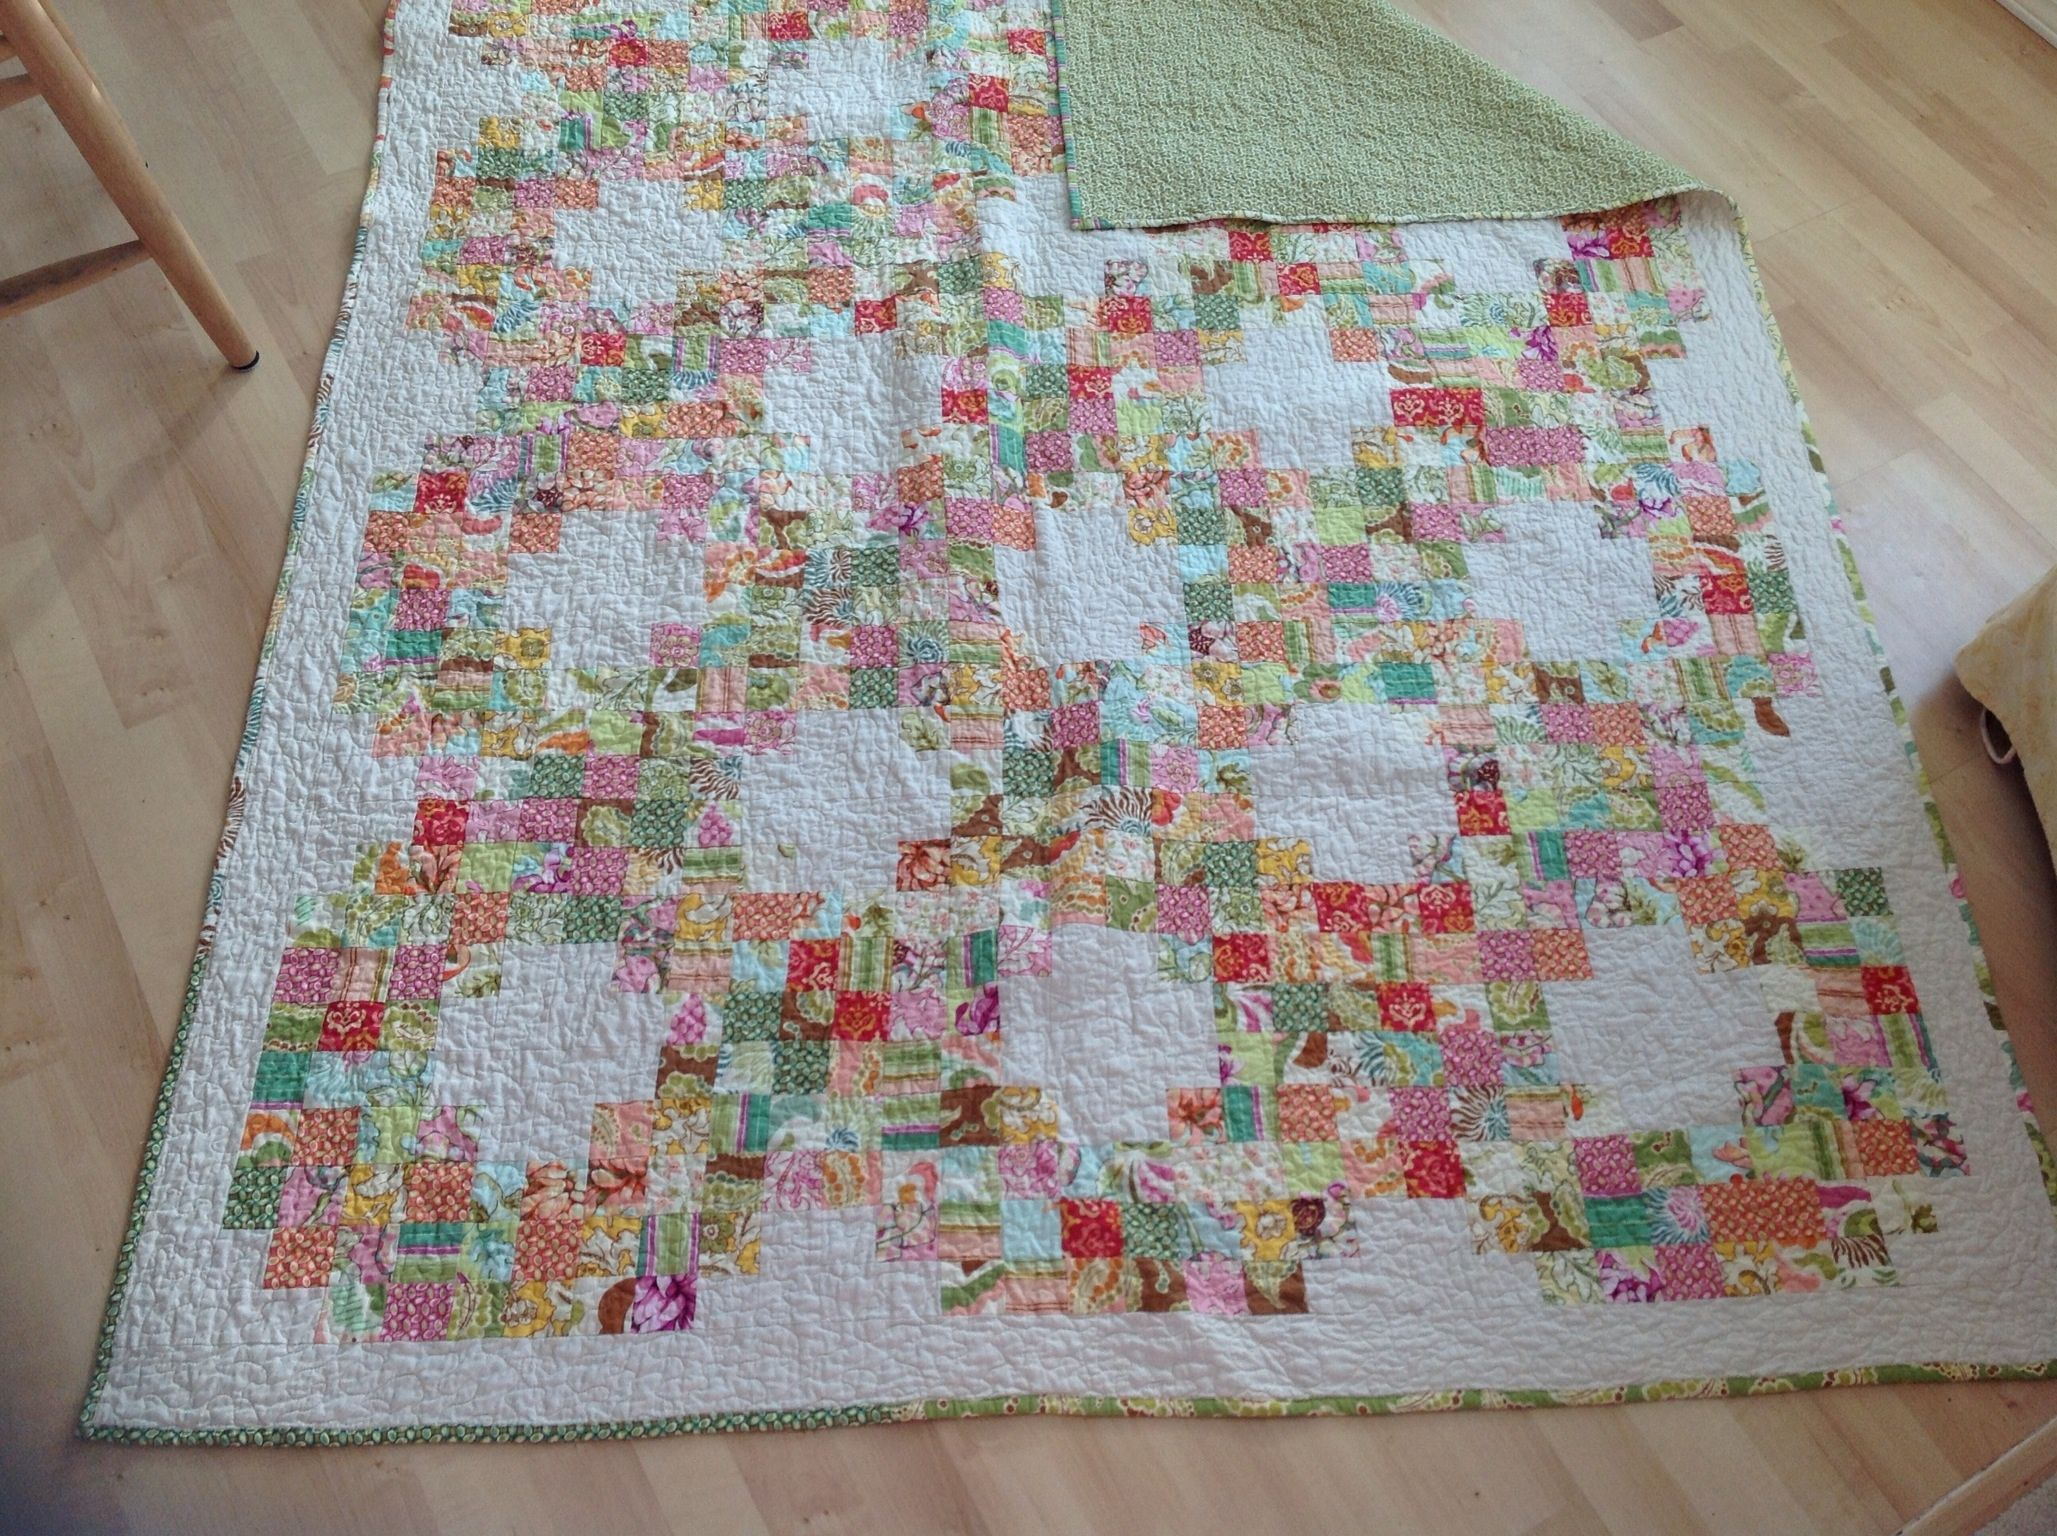 Second quilt